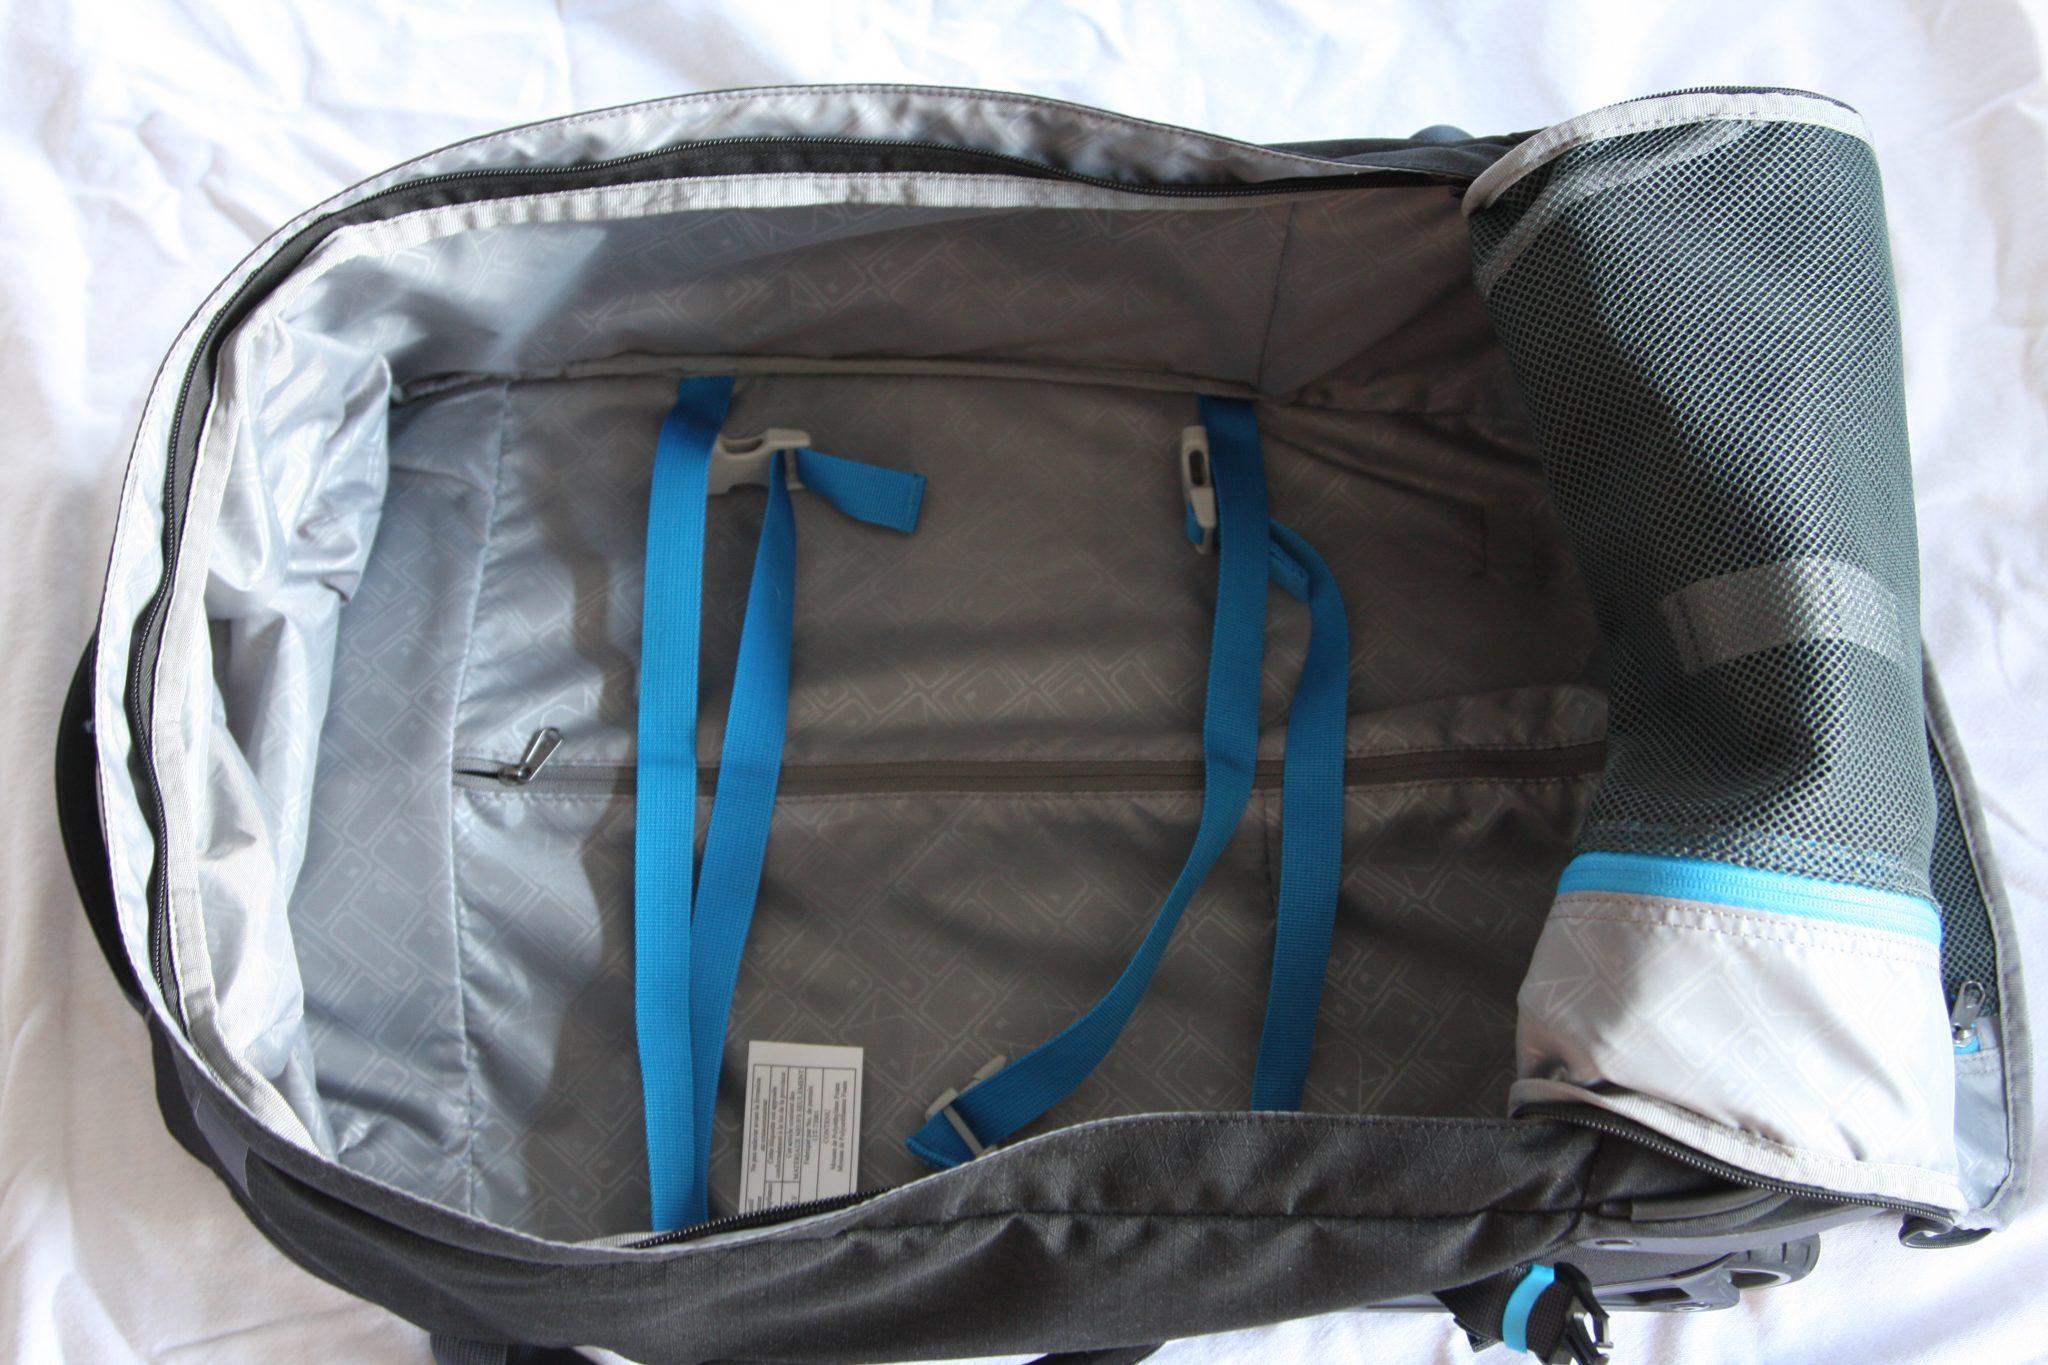 Eagle Creek Doubleback Wheeled Backpack open